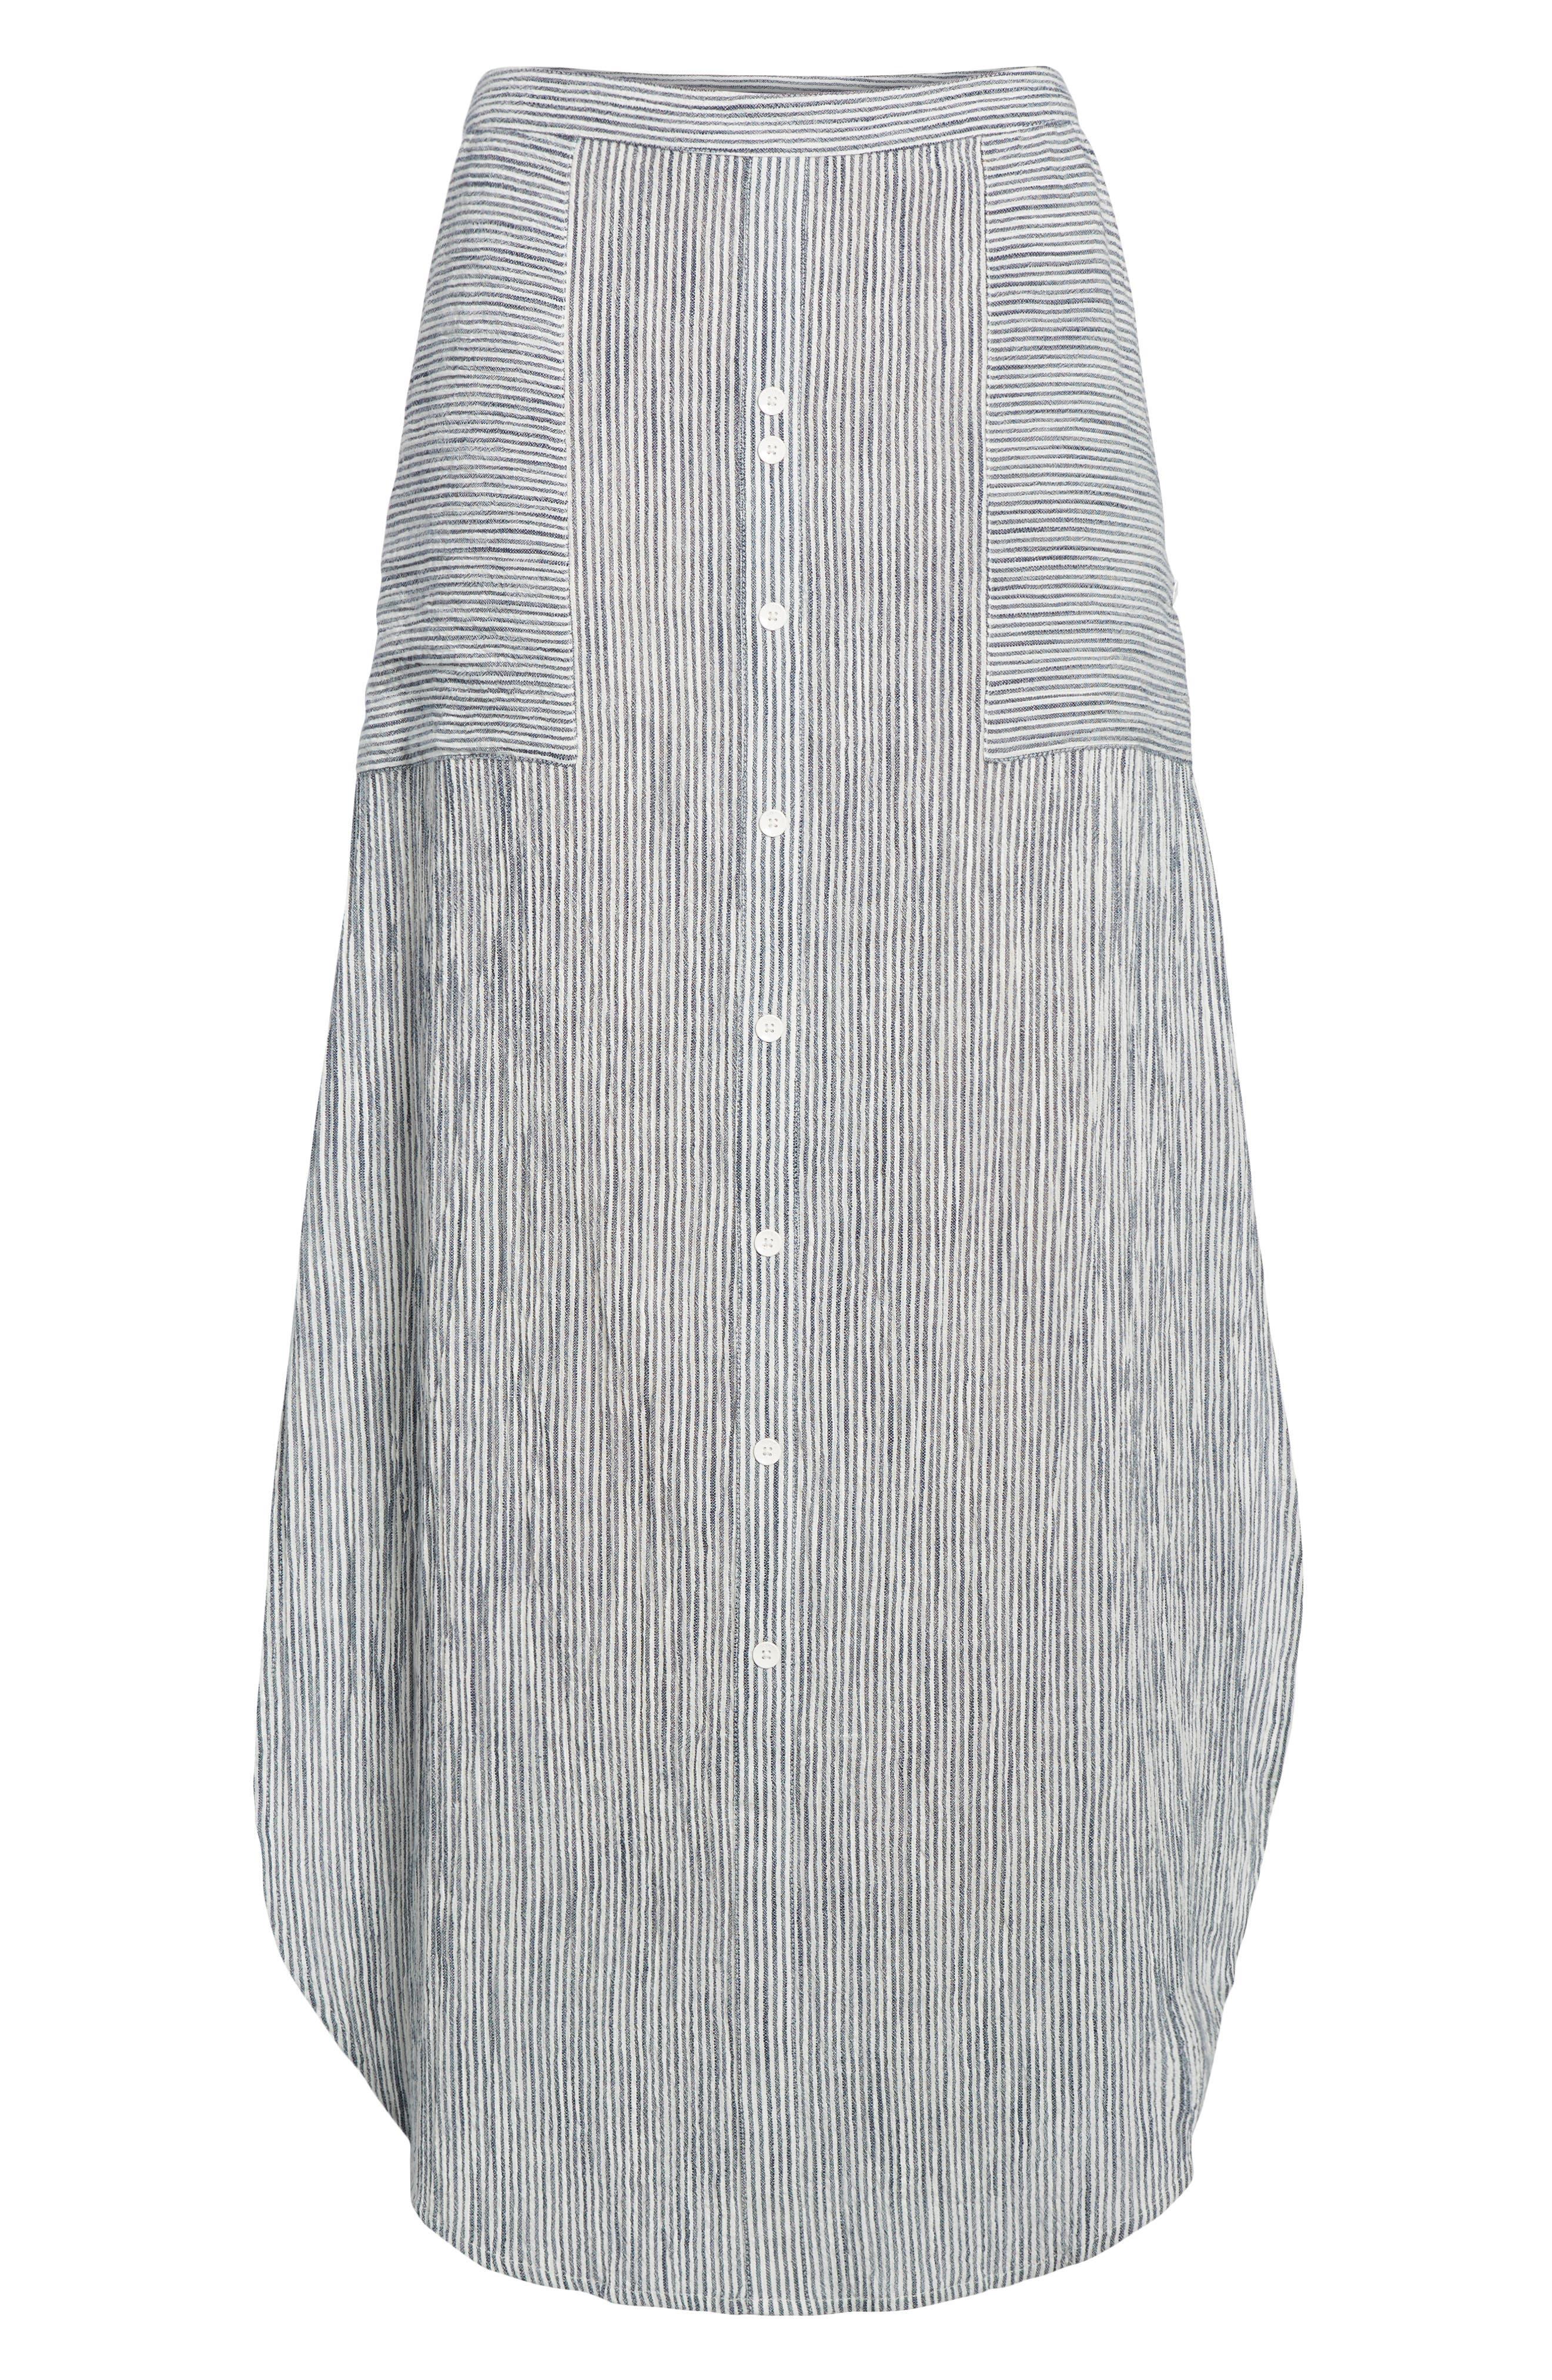 Sunset Islands Pinstripe Maxi Skirt,                             Alternate thumbnail 6, color,                             101